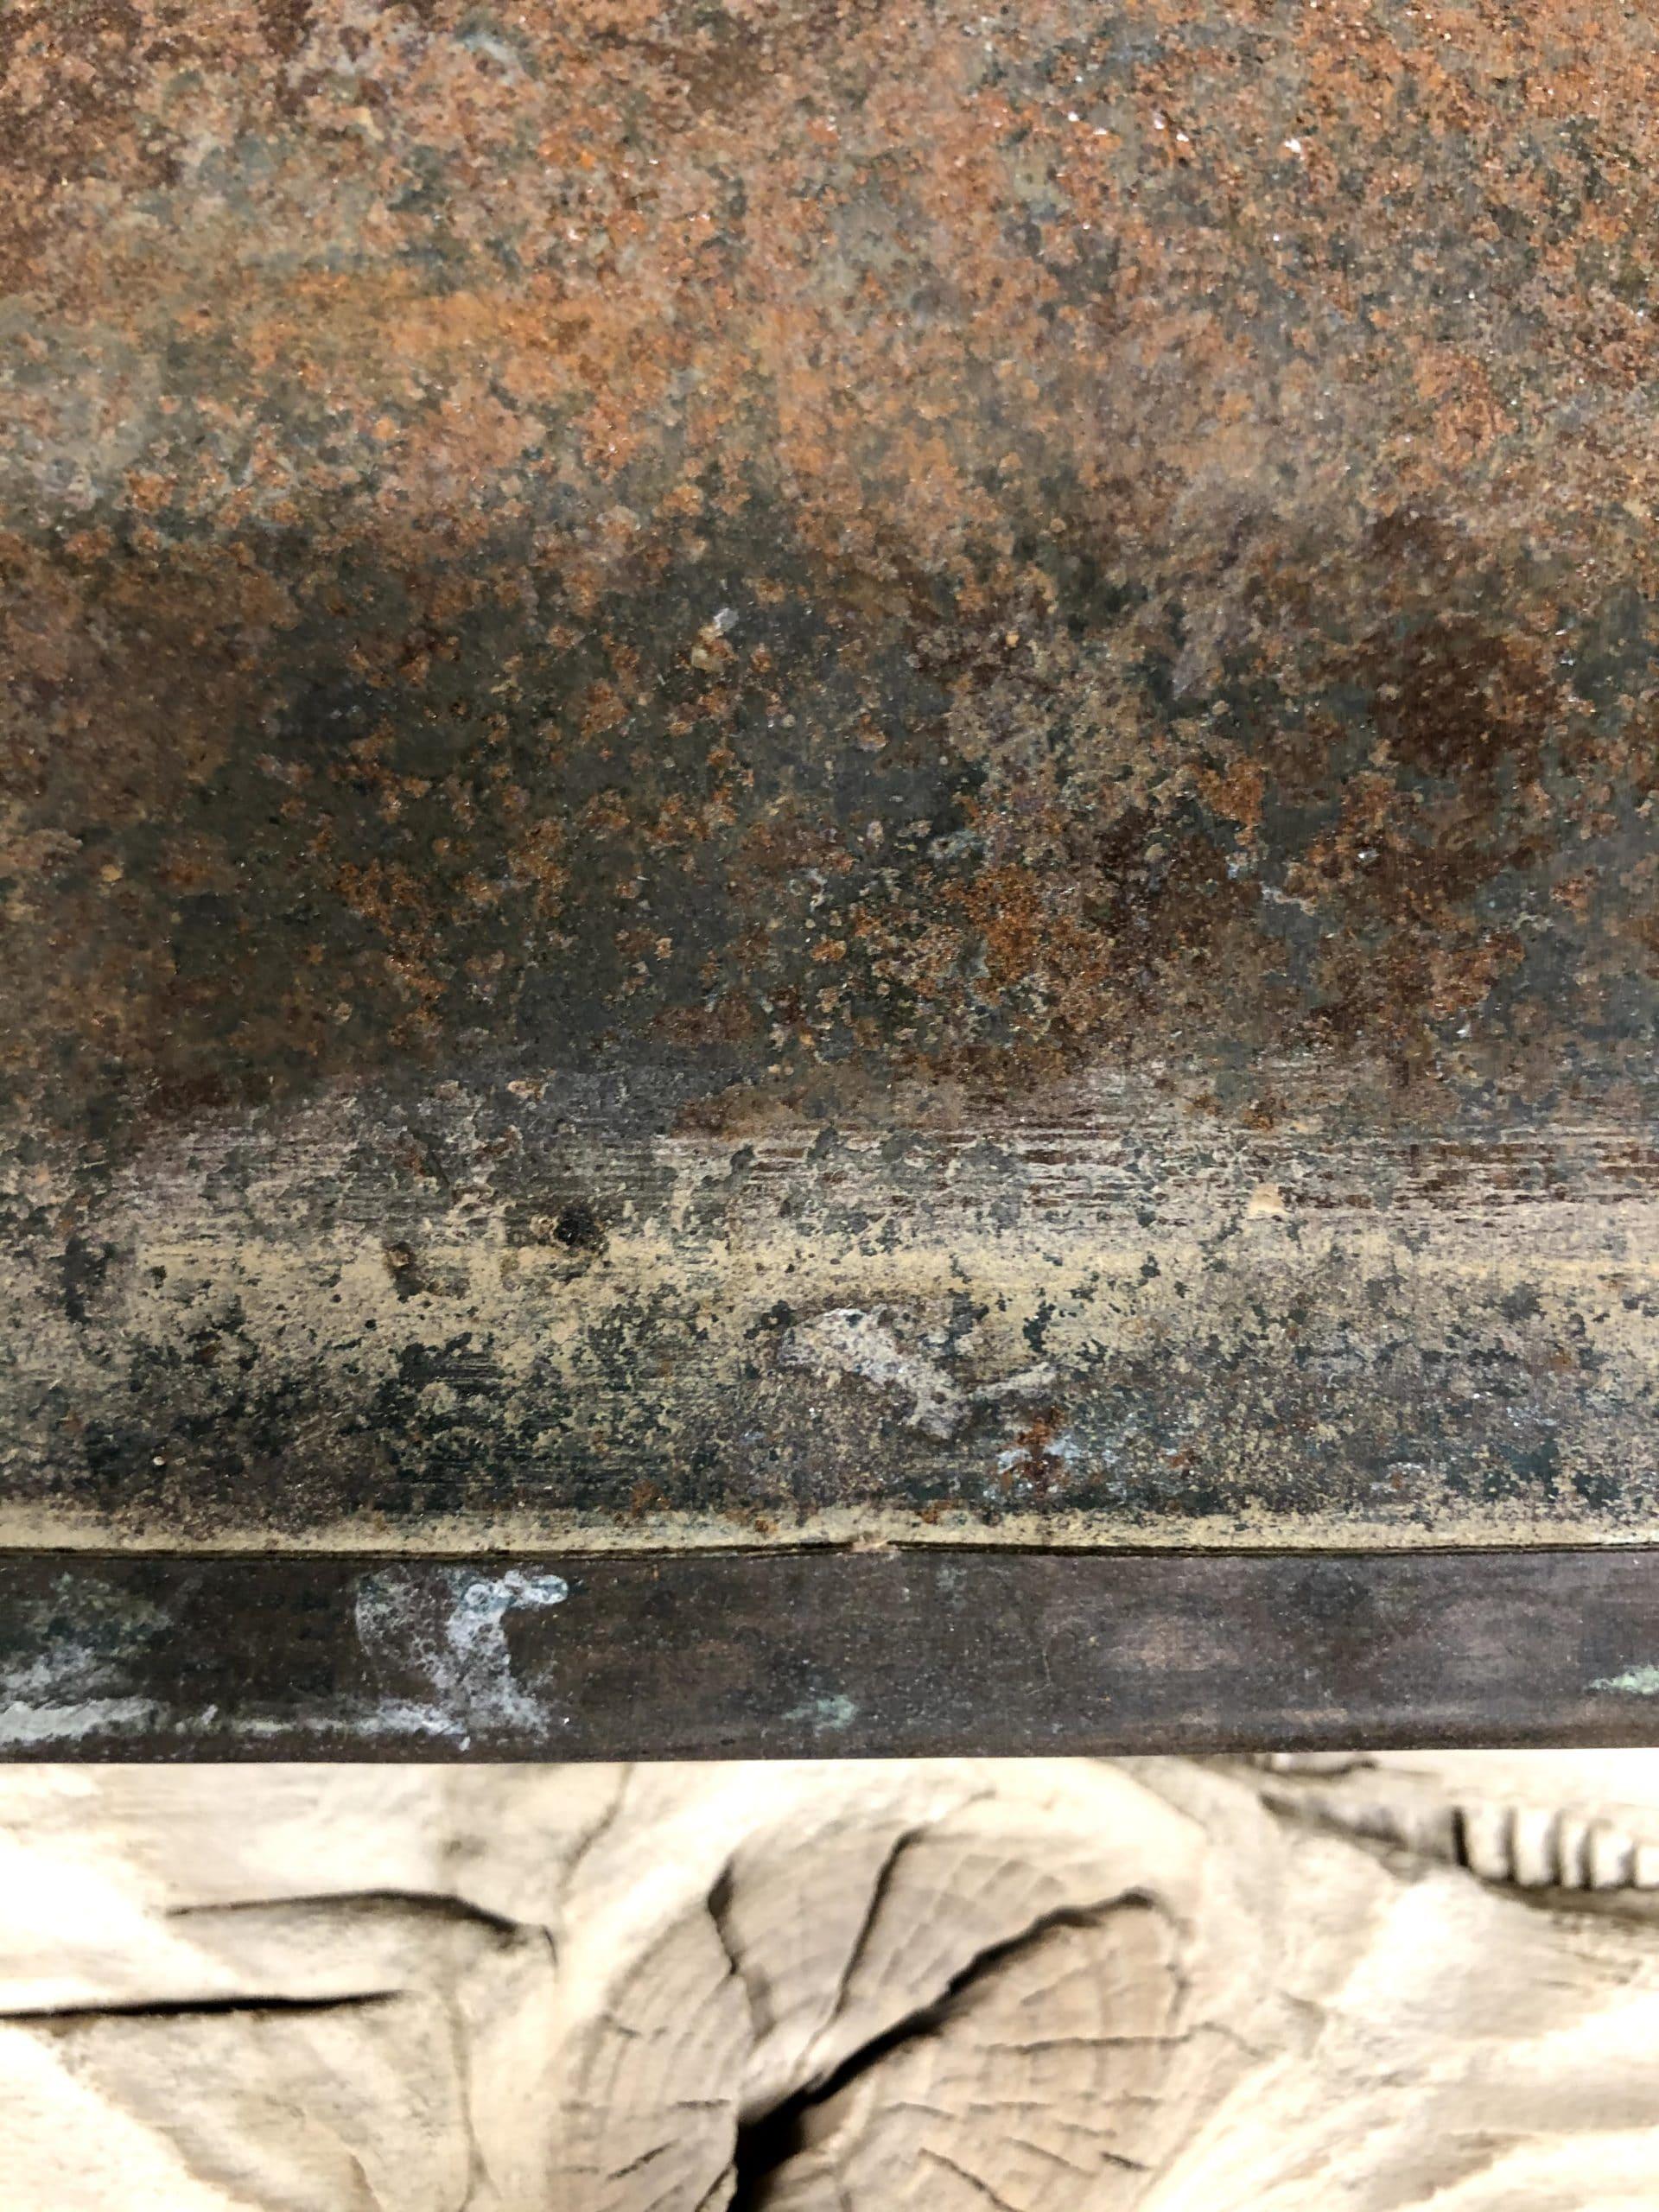 Corrosion très visible